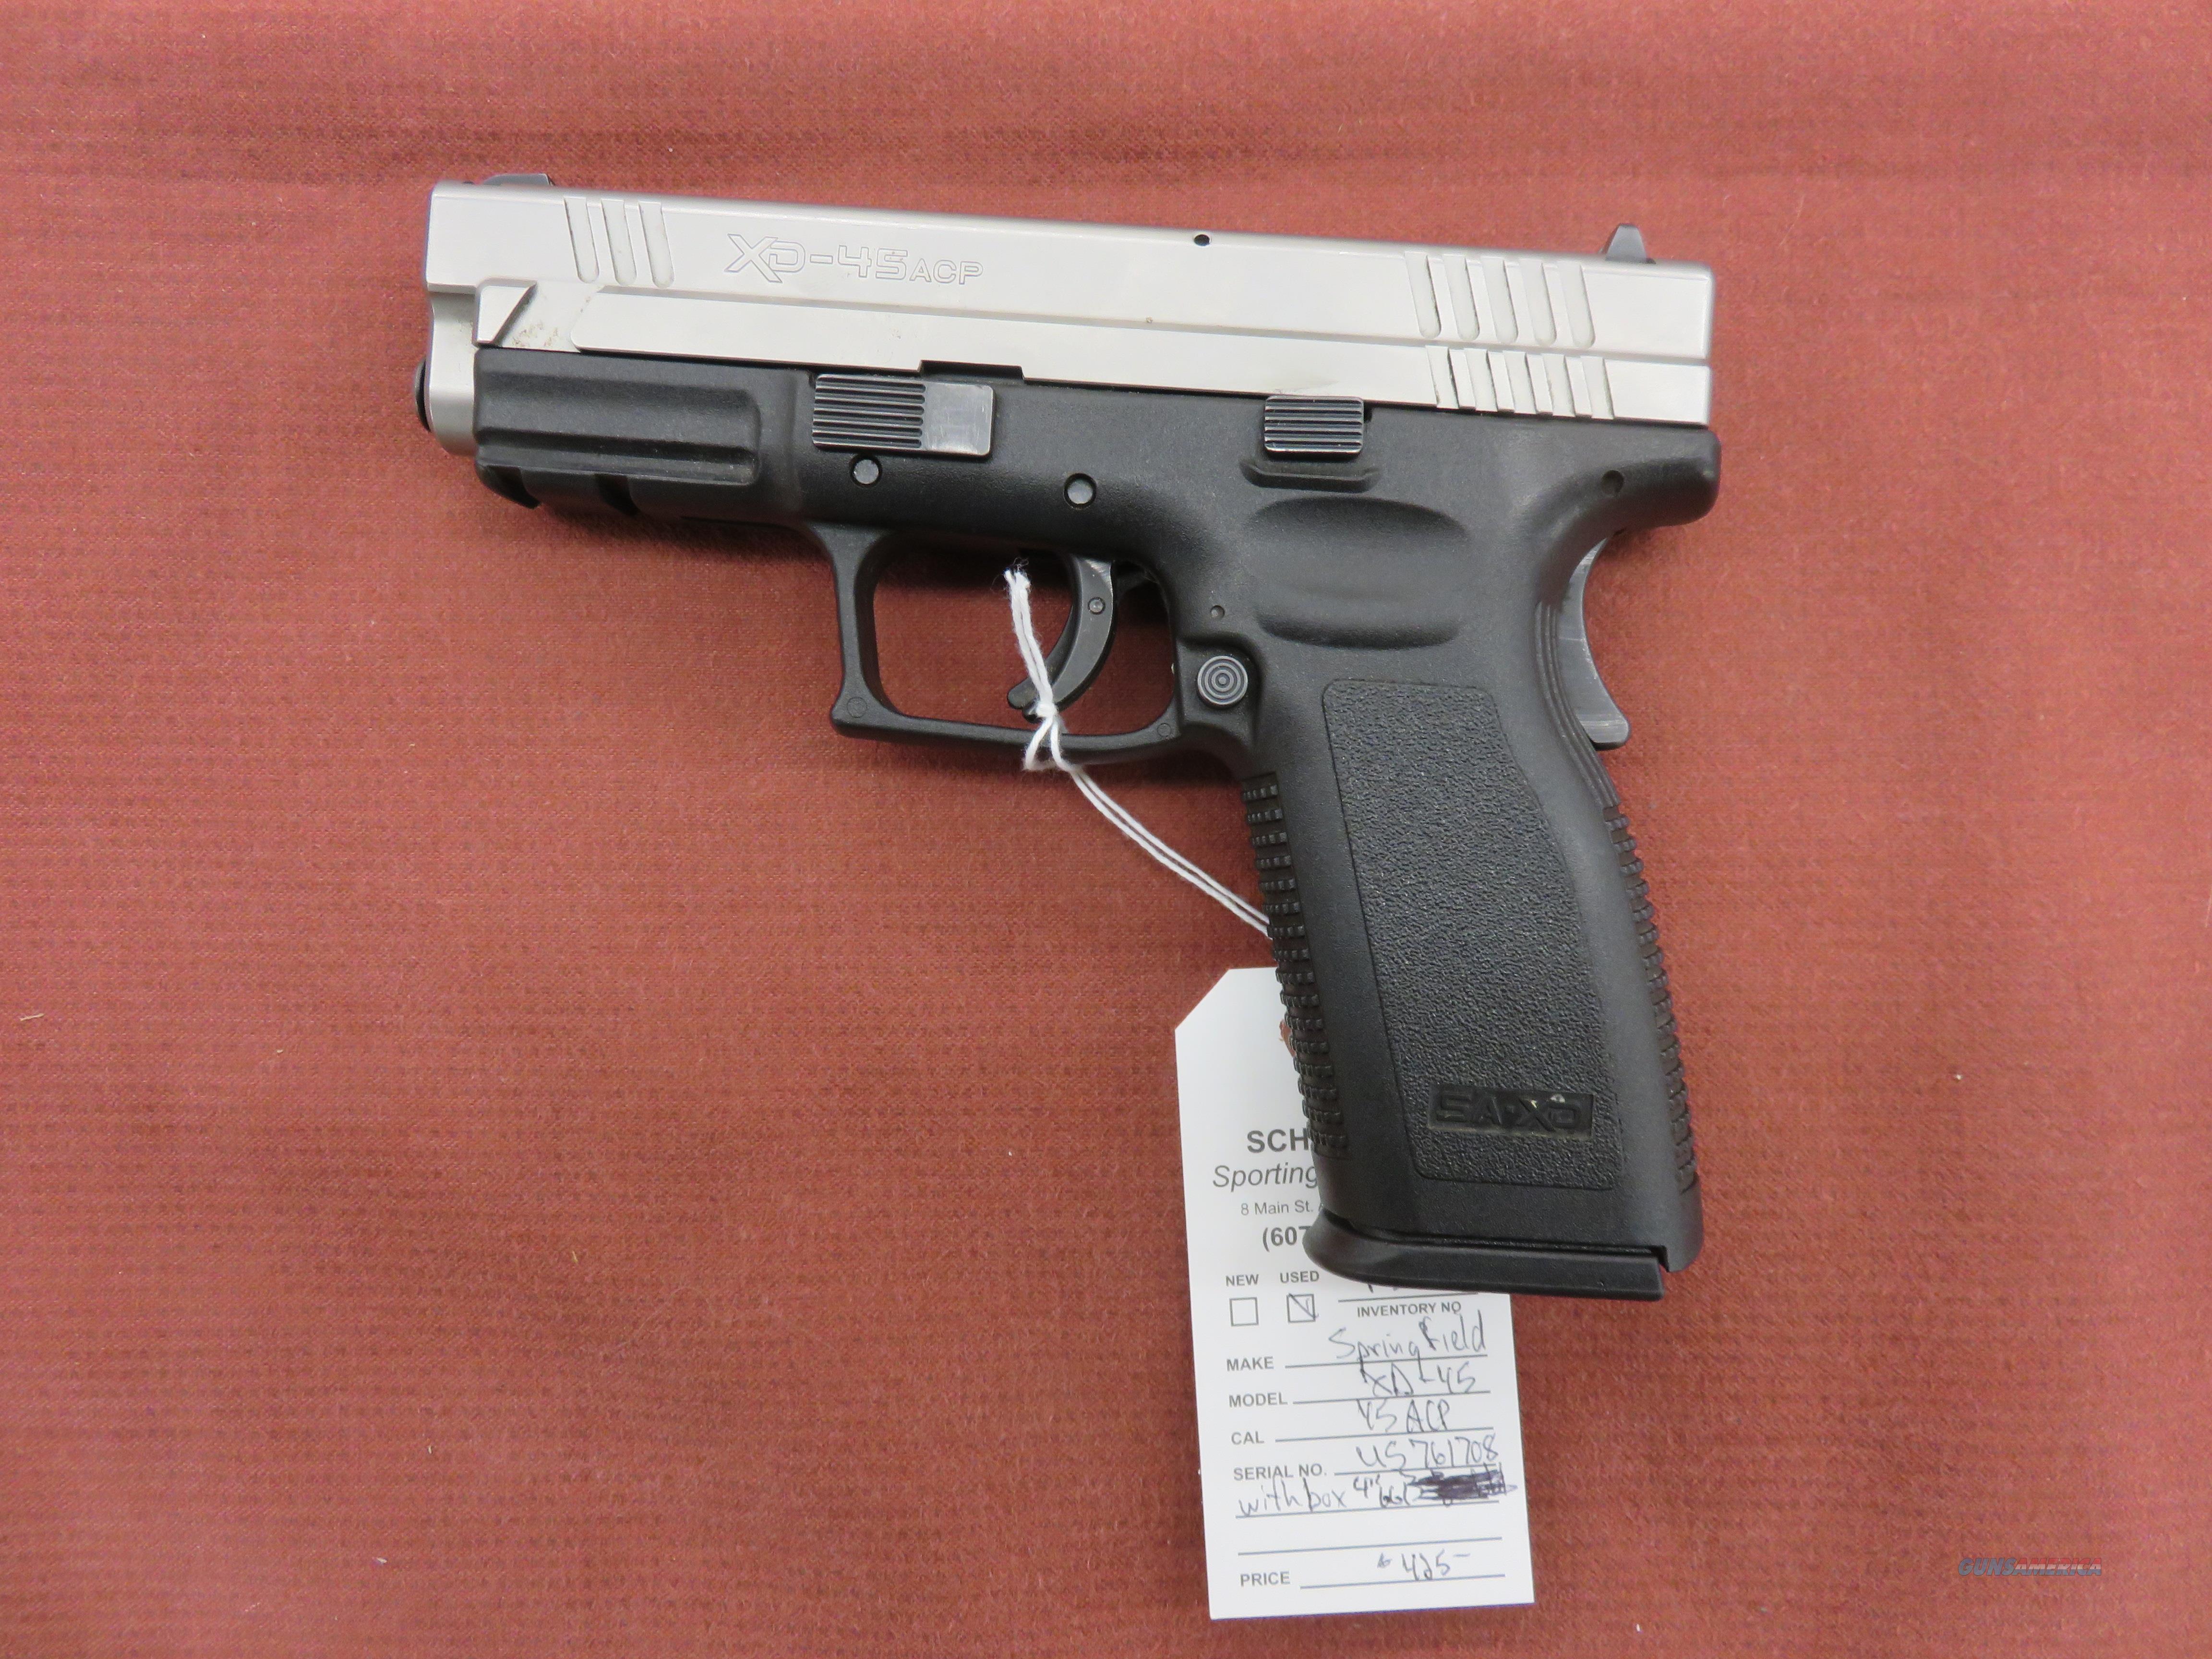 Springfield Armory XD-45  Guns > Pistols > Springfield Armory Pistols > XD (eXtreme Duty)